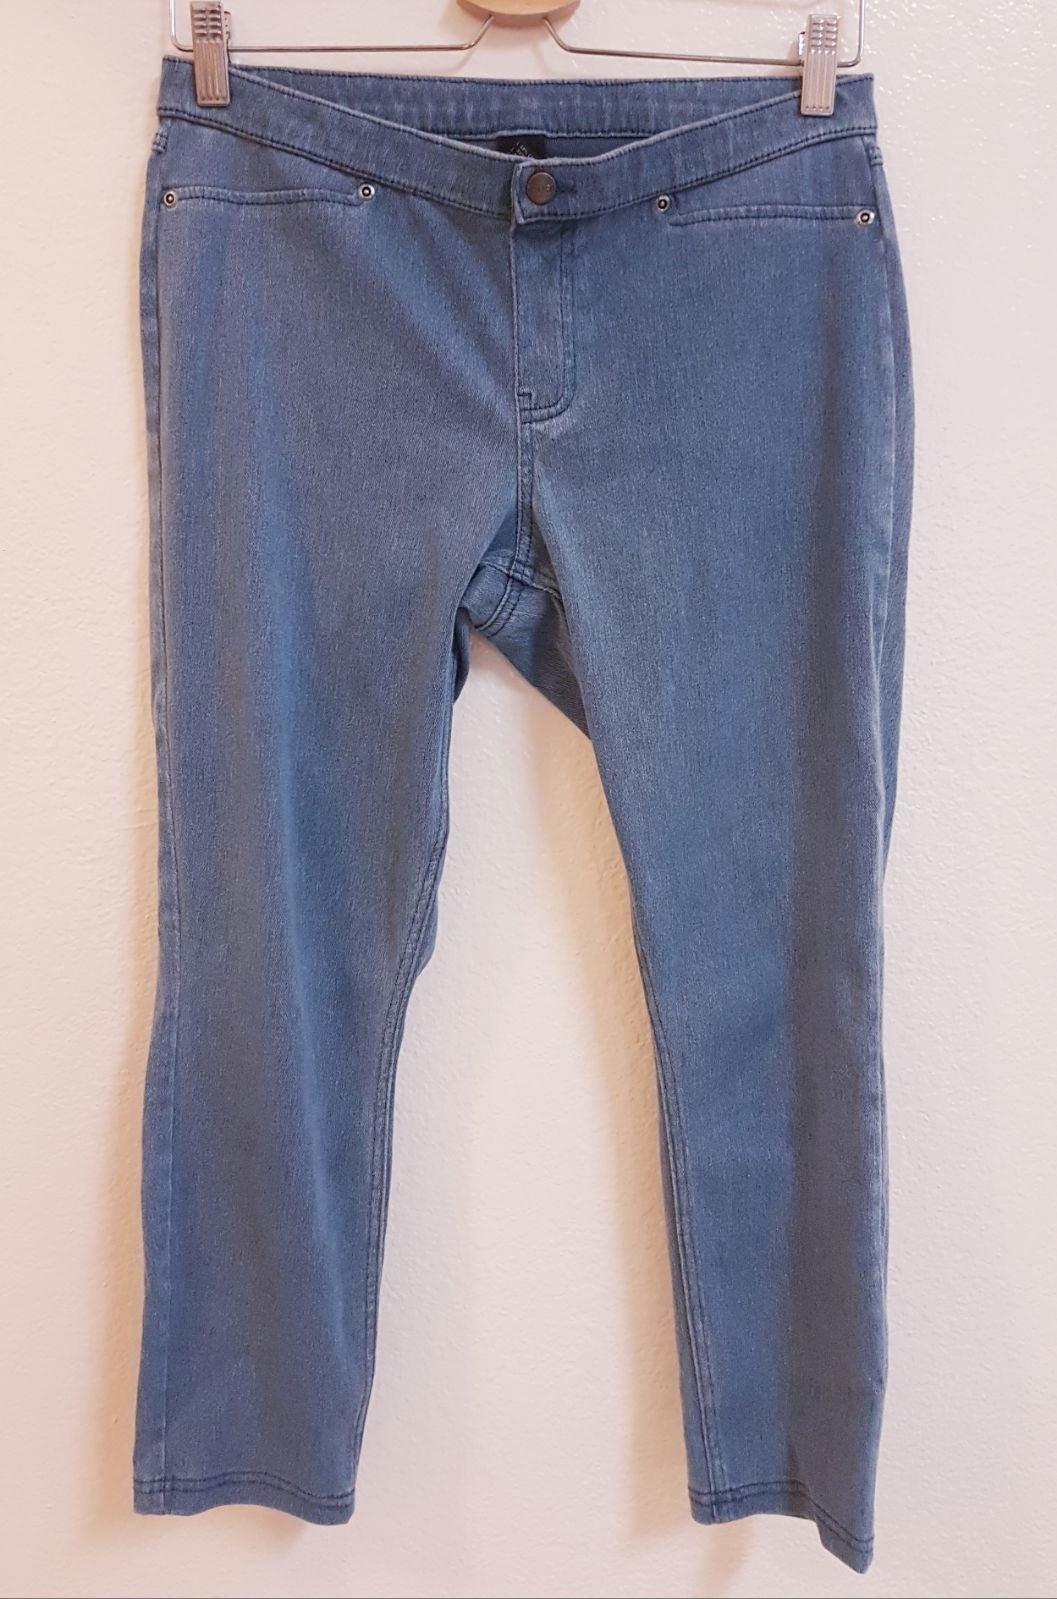 HUE short stretchy legging jean